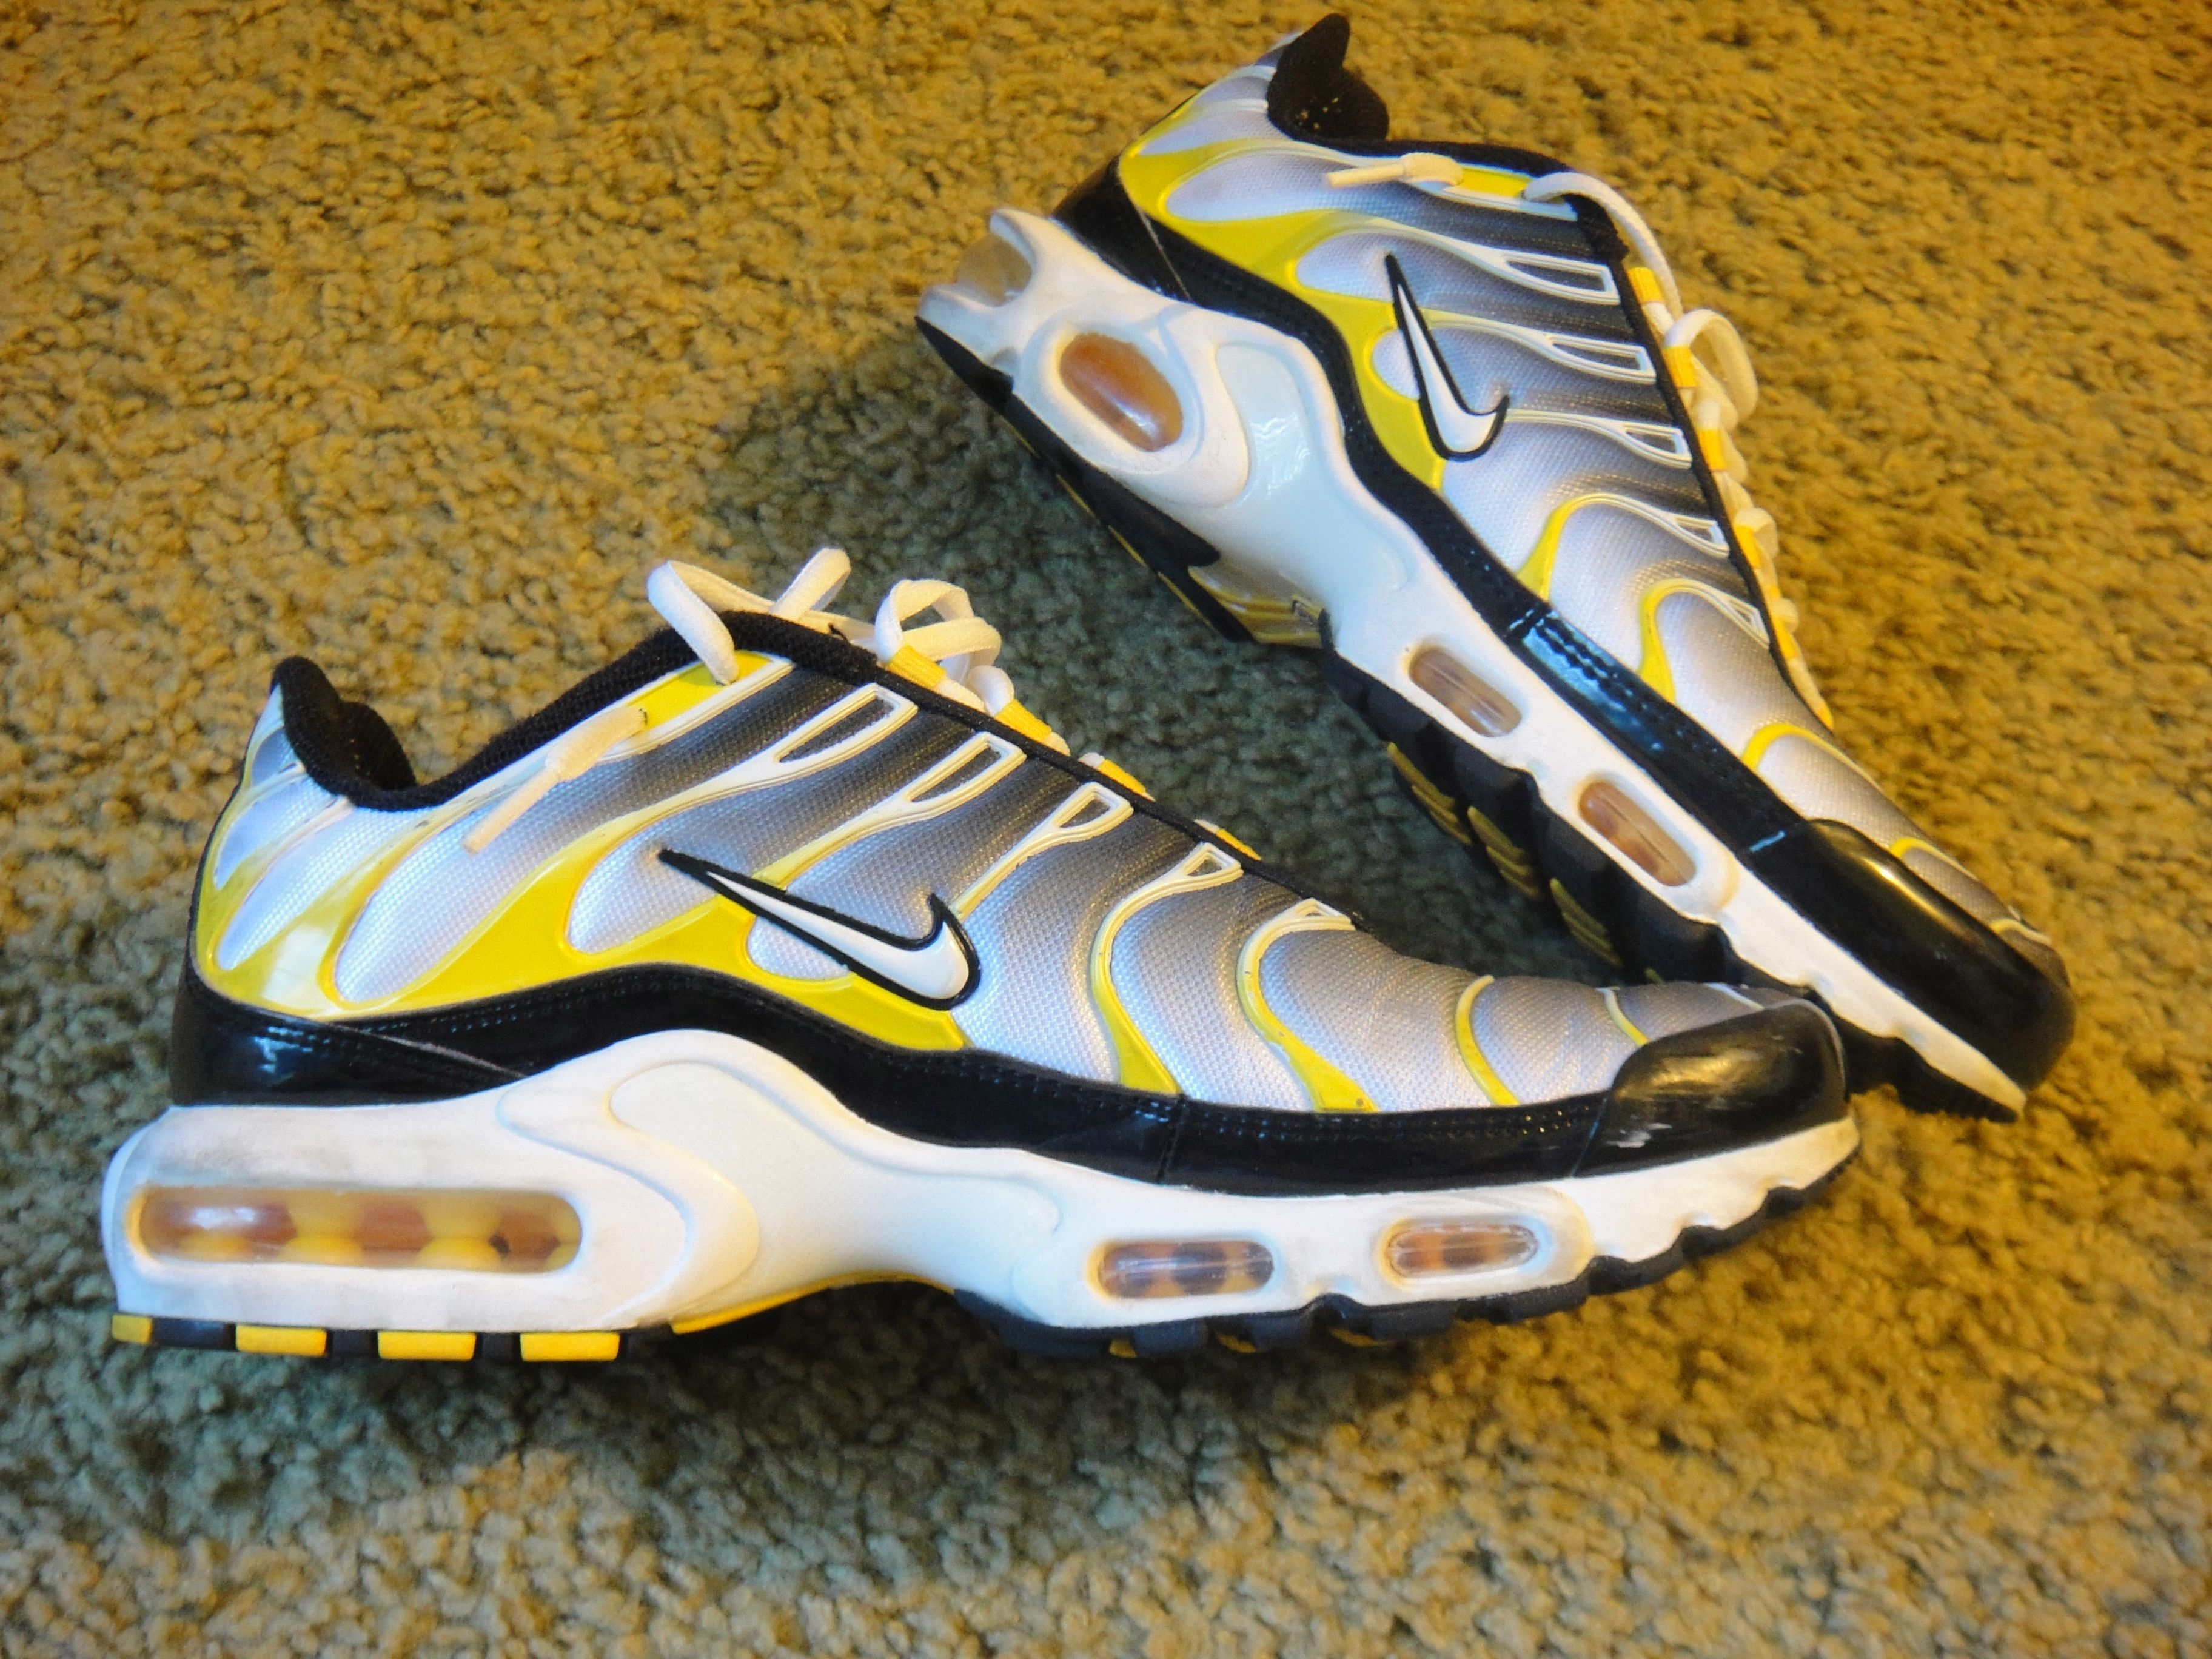 hot sale online d6e7f 91d55 Sneaker Central - NIKEÂ TUNED 1  COMMANDO  - Foot Locker   clothing   Nike  air max, Nike shoes, Nike air max plus